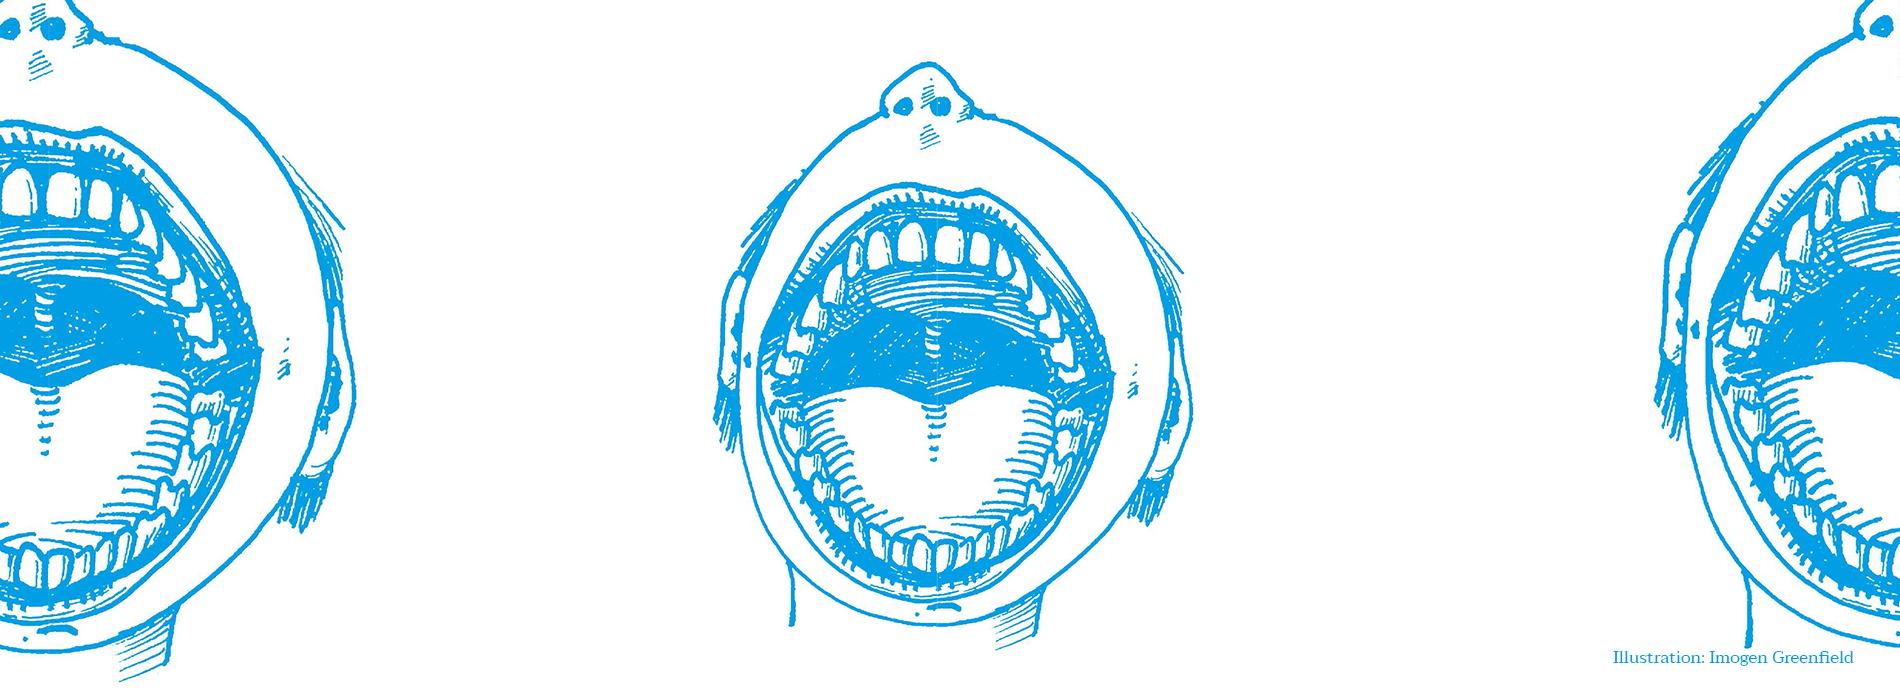 New Zealand Has A Dental Care Crisis